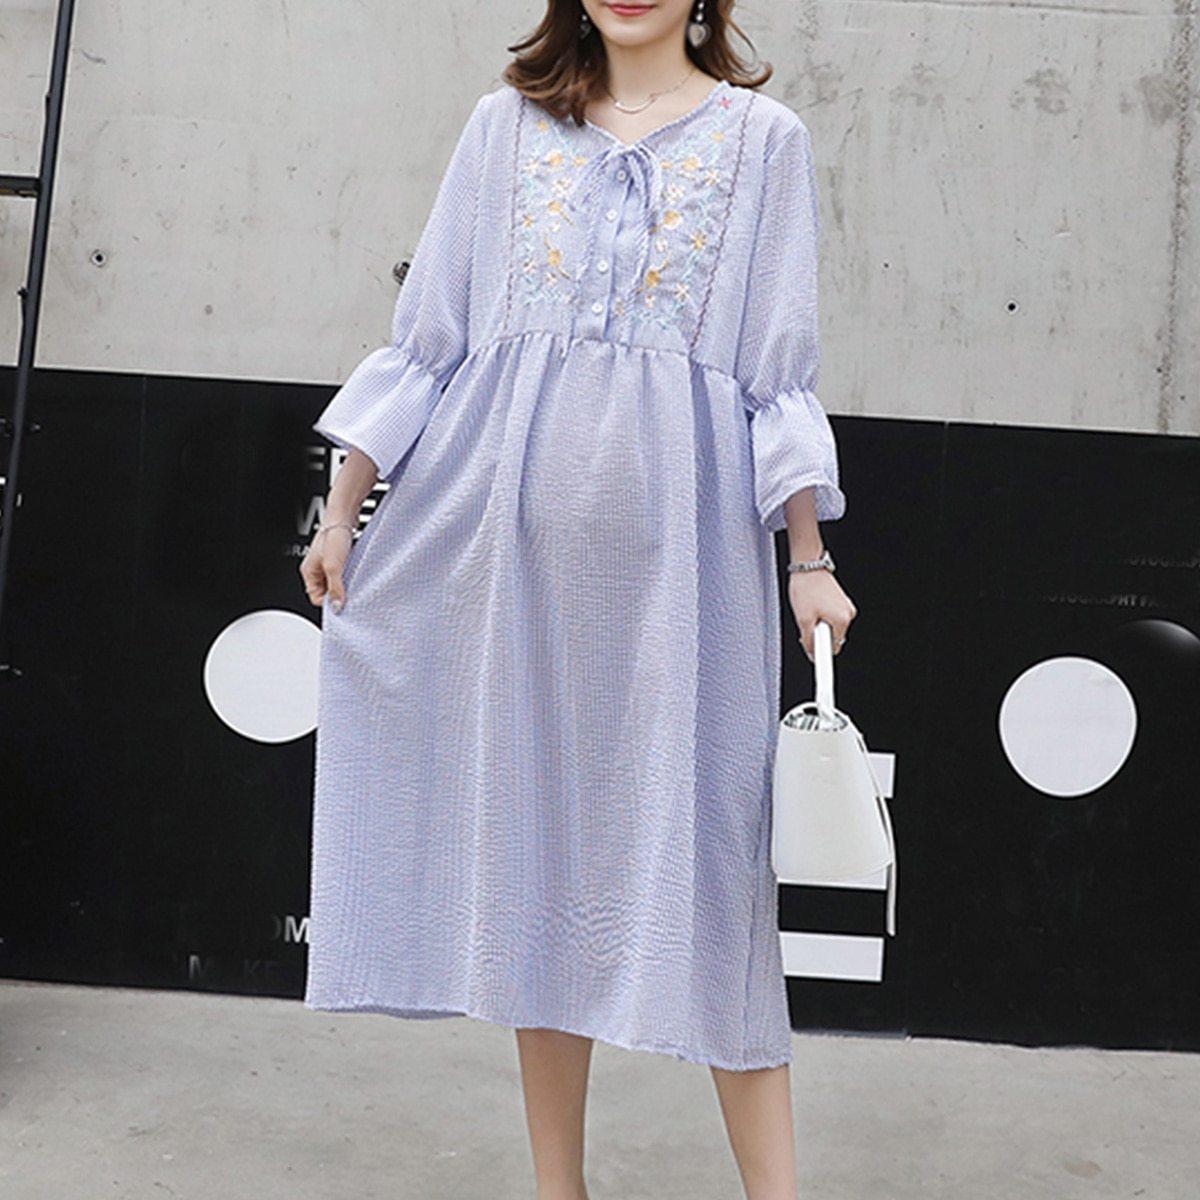 Maternity's Dress Fashion Long Sleeve Embroidery Pattern Loose Dress image 4